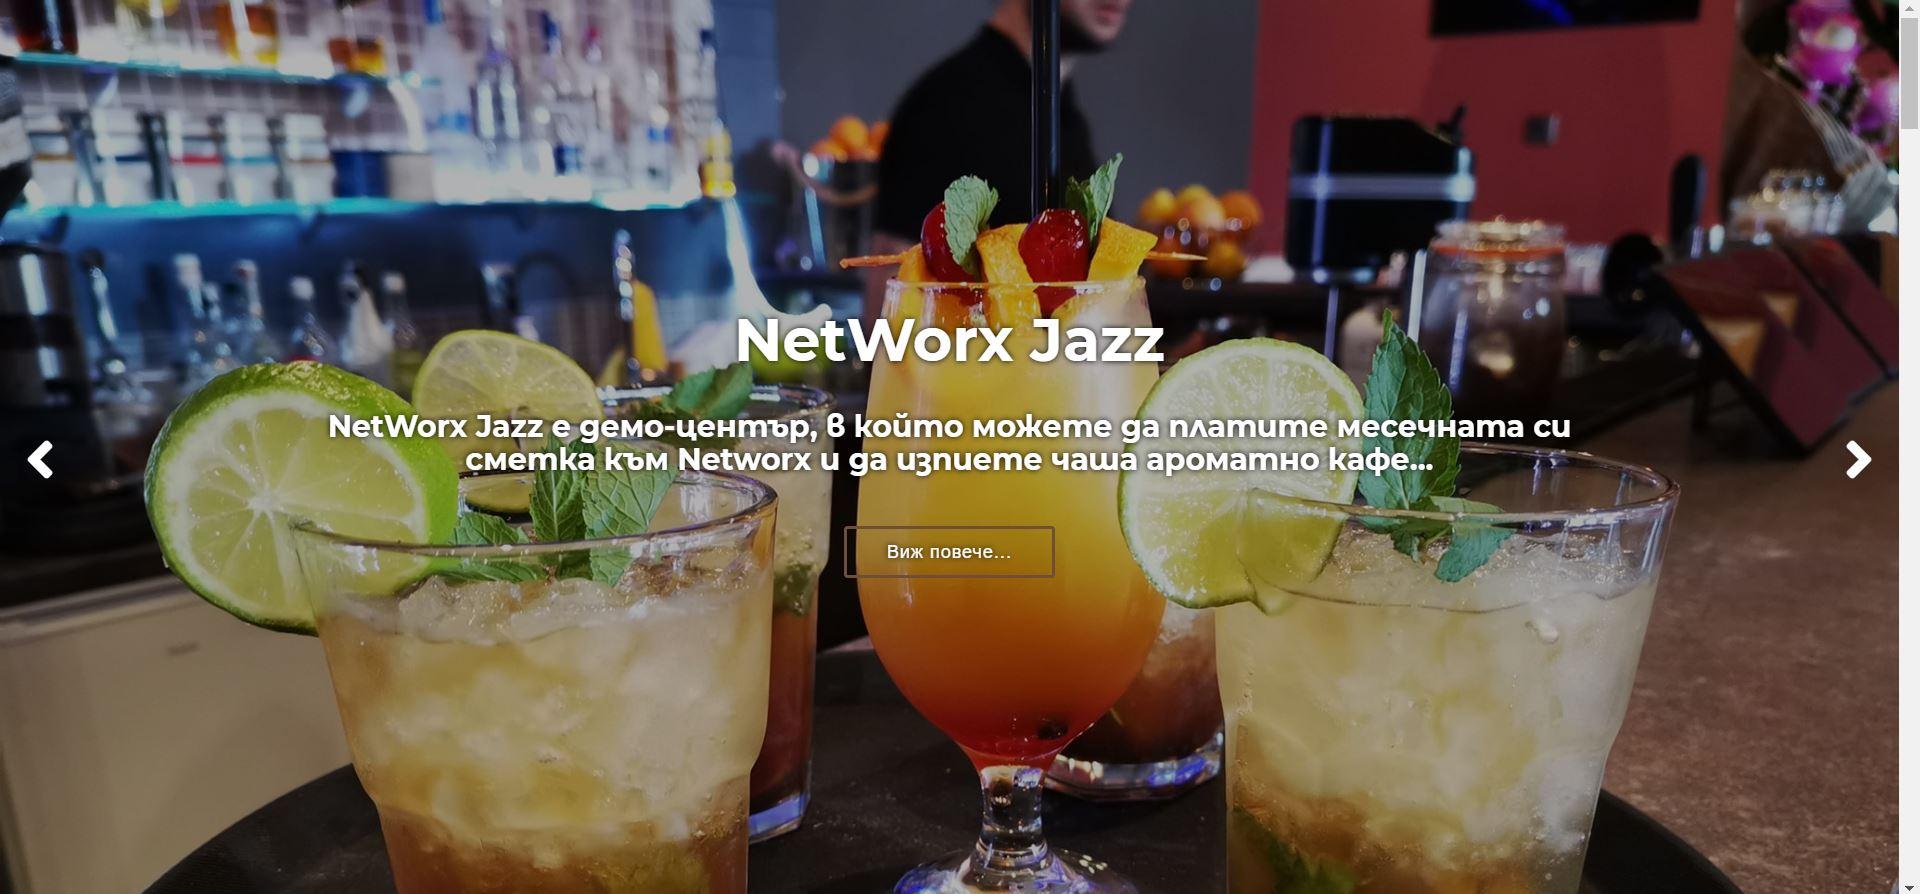 NetWorx Jazz